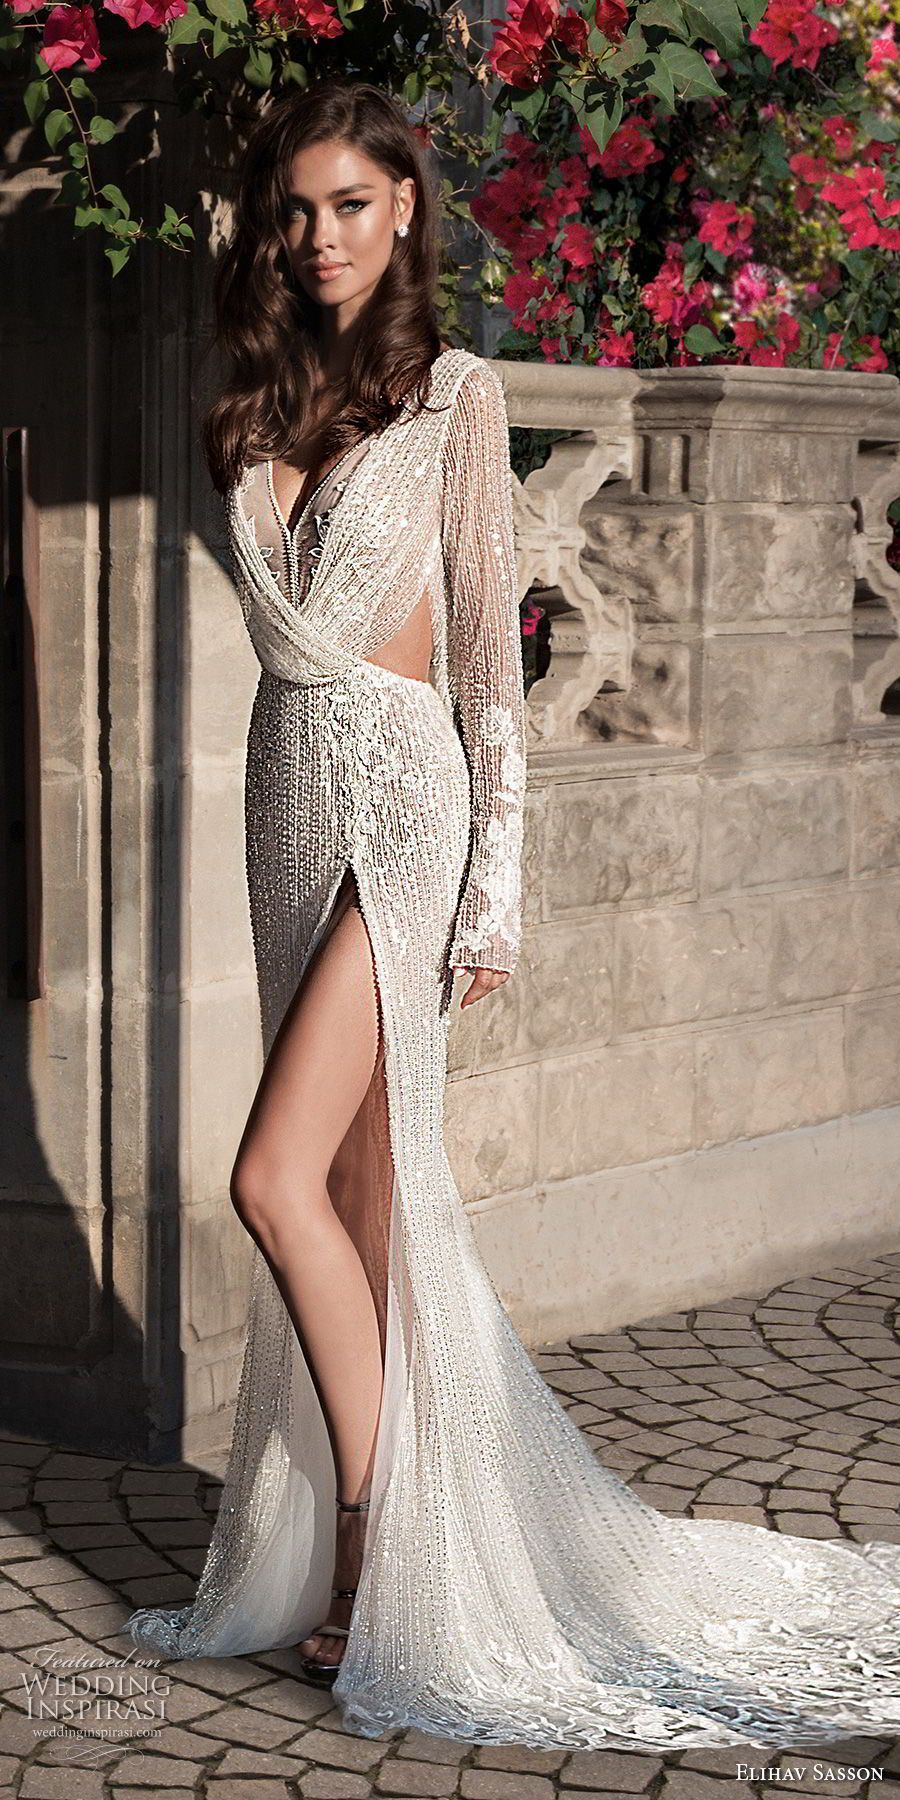 a7f538dbfa08 elihav sasson 2018 capsule bridal long sleeves v neck full embellishment  high slit skirt sheath wedding dress open back chapel train (11) mv --  Elihav ...